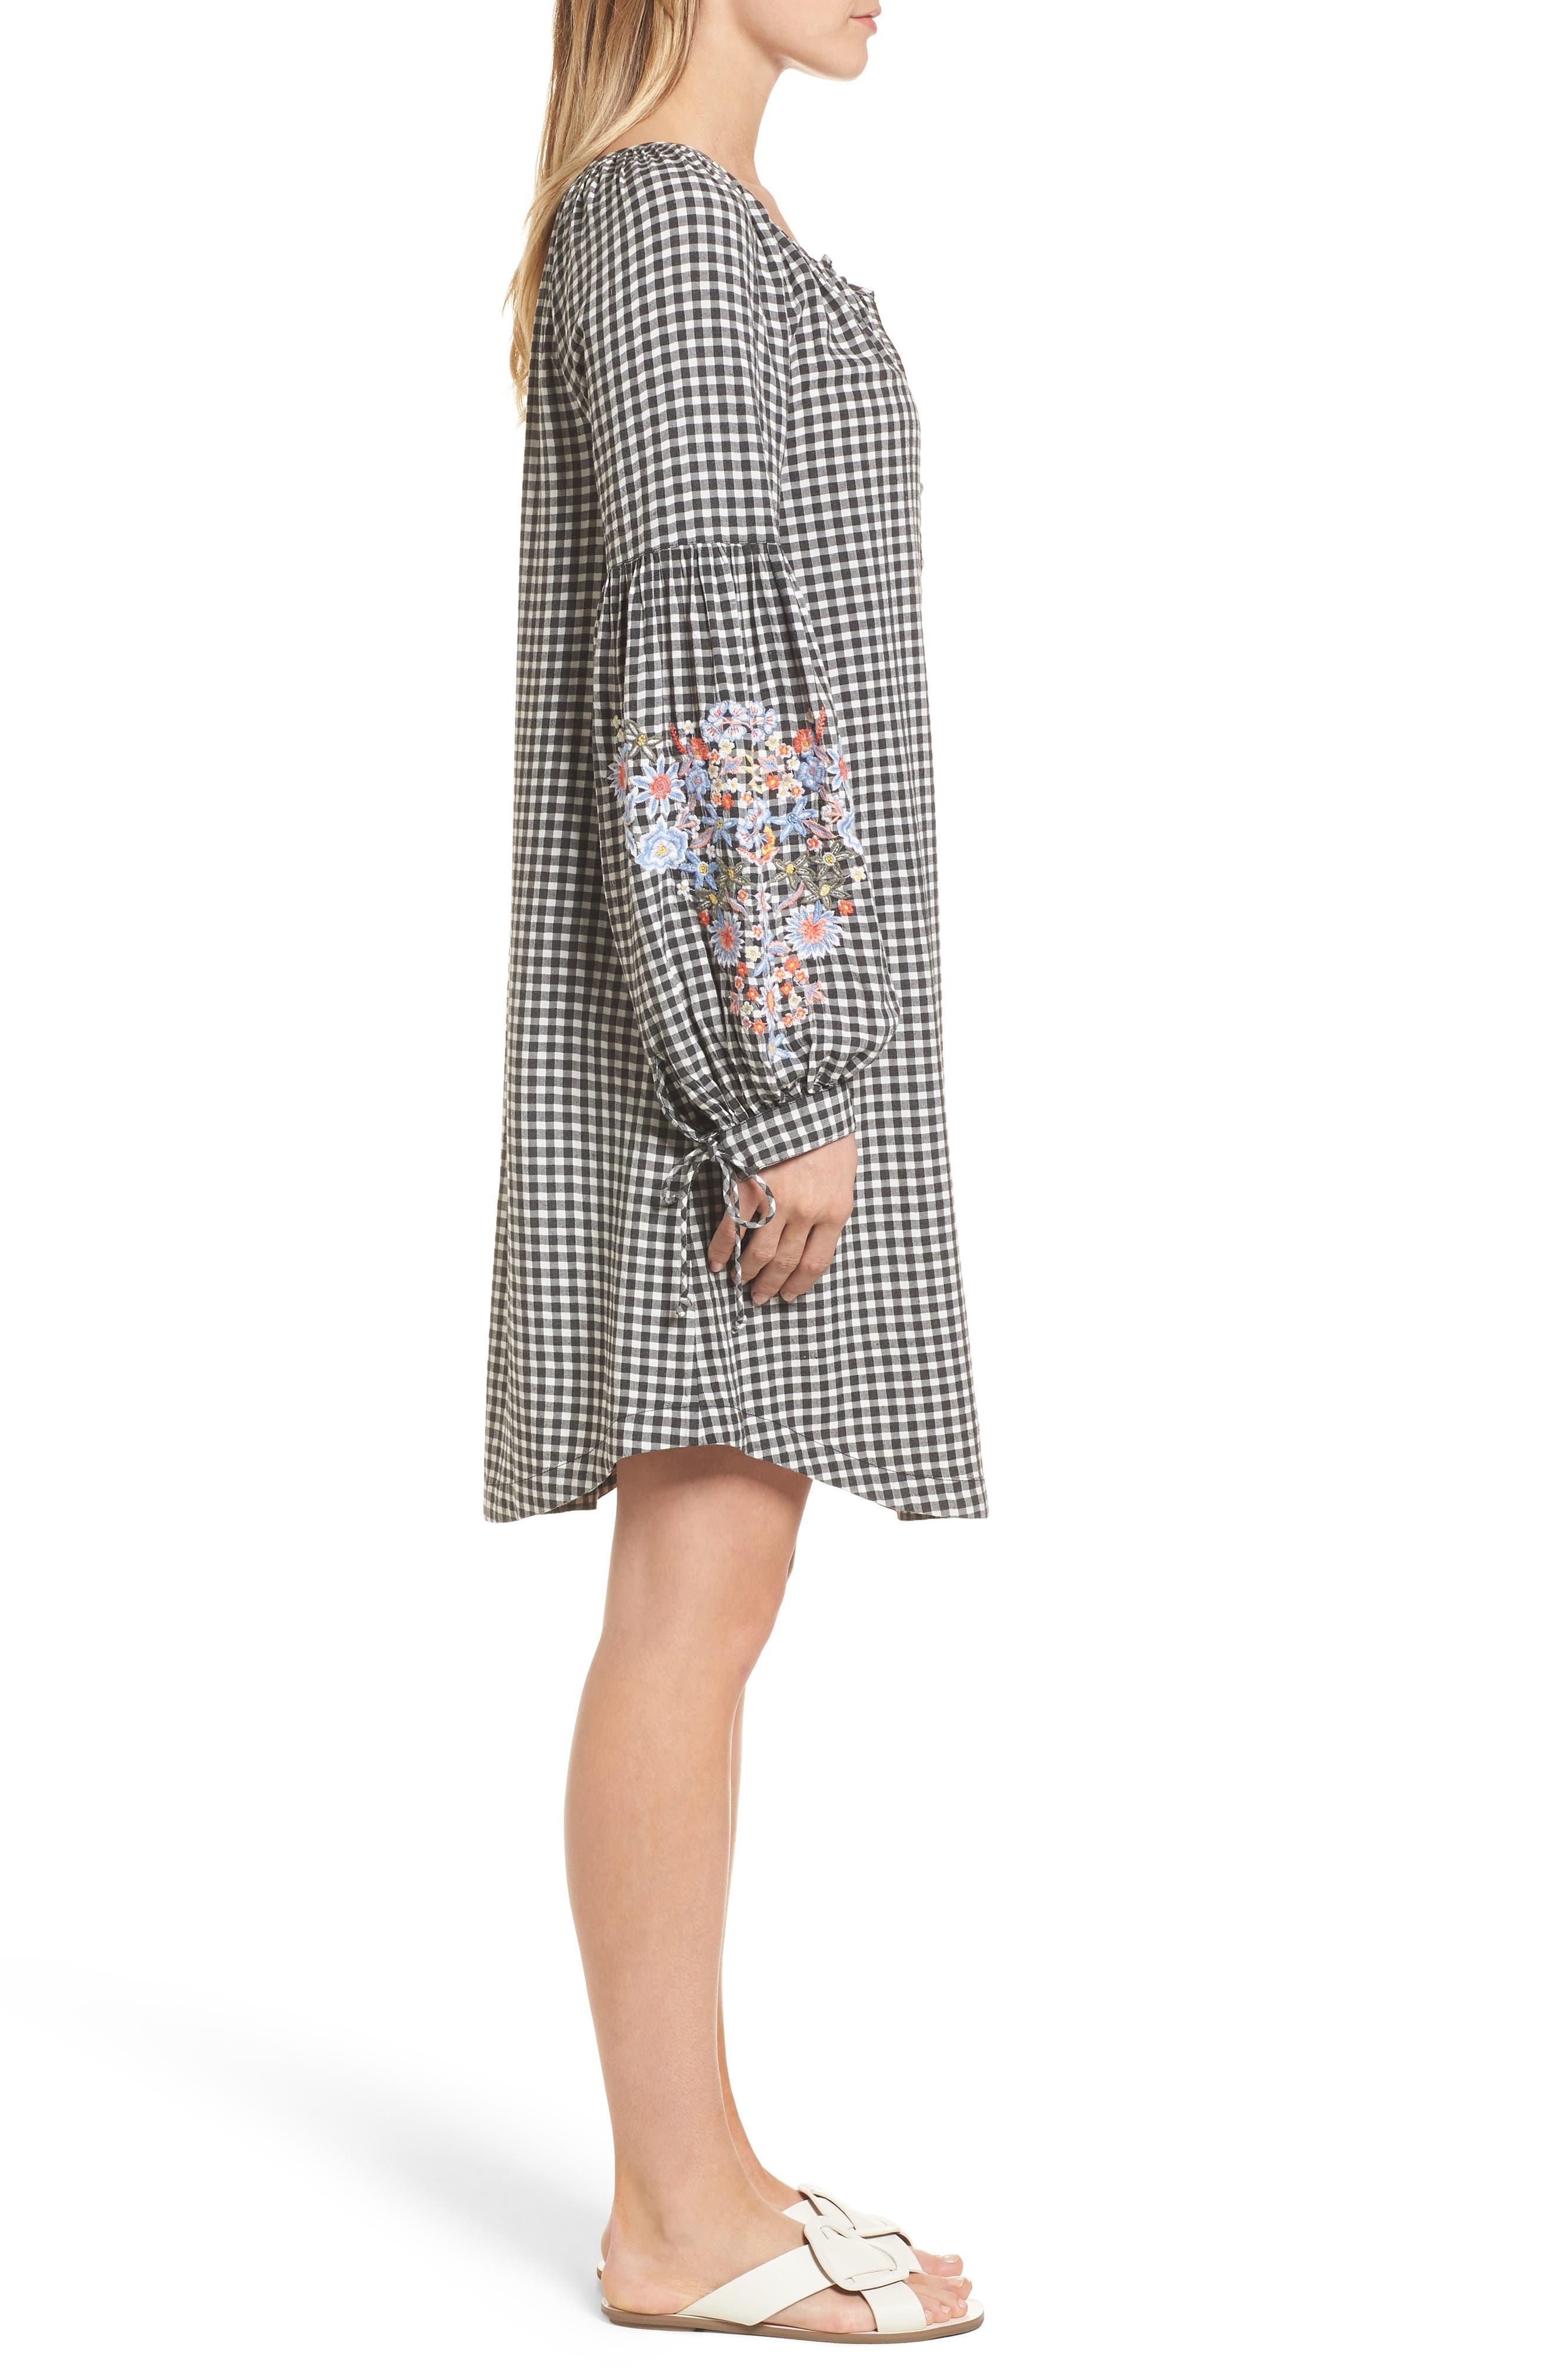 Embroidered Sleeve Shift Dress,                             Alternate thumbnail 3, color,                             Black-White Gingham